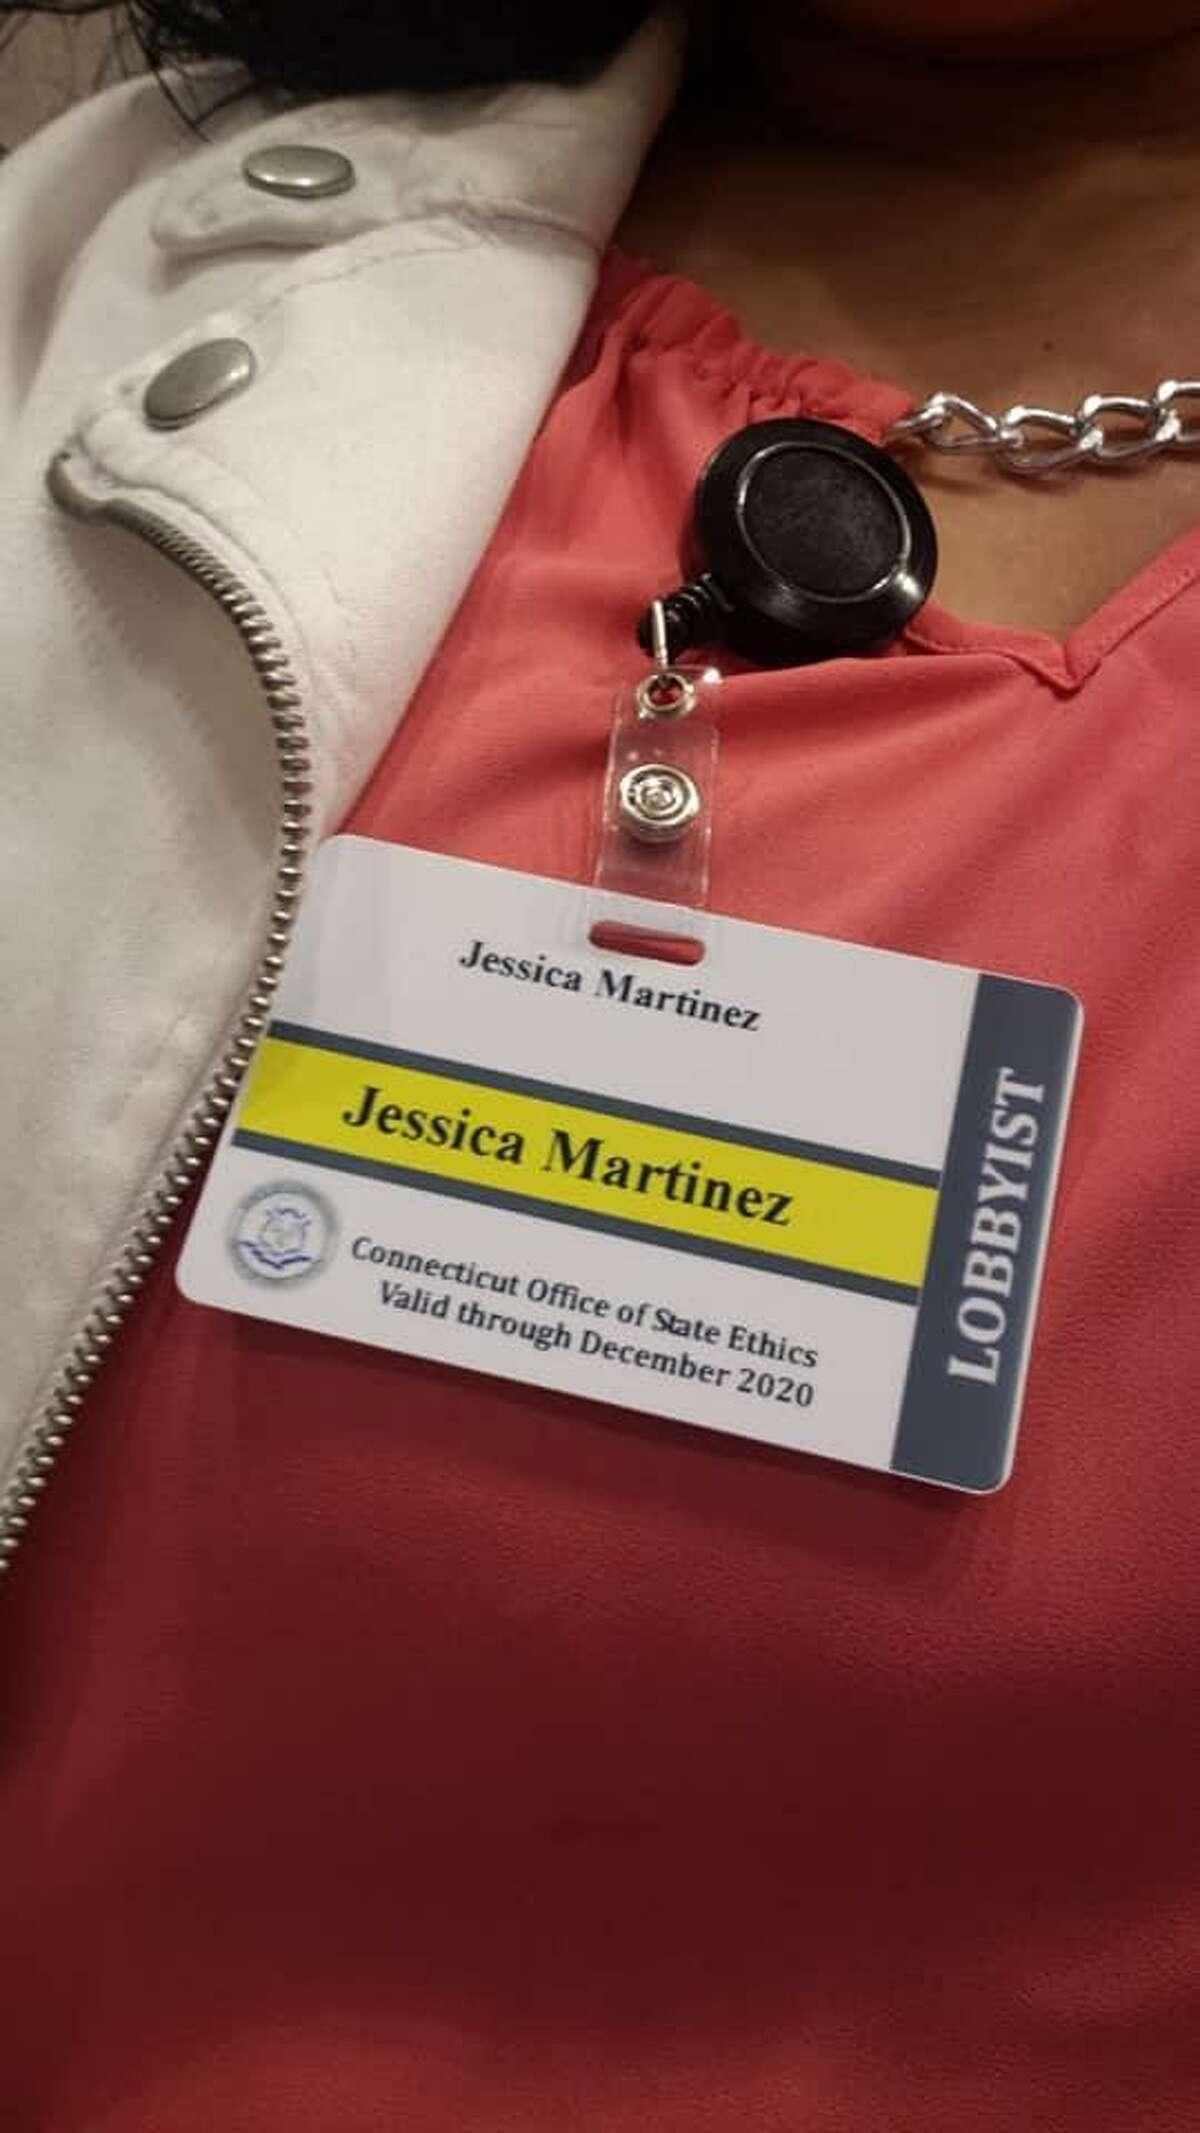 Bridgeport School Board Member Jessica Martinez is also a lobbyist for the school choice movement.